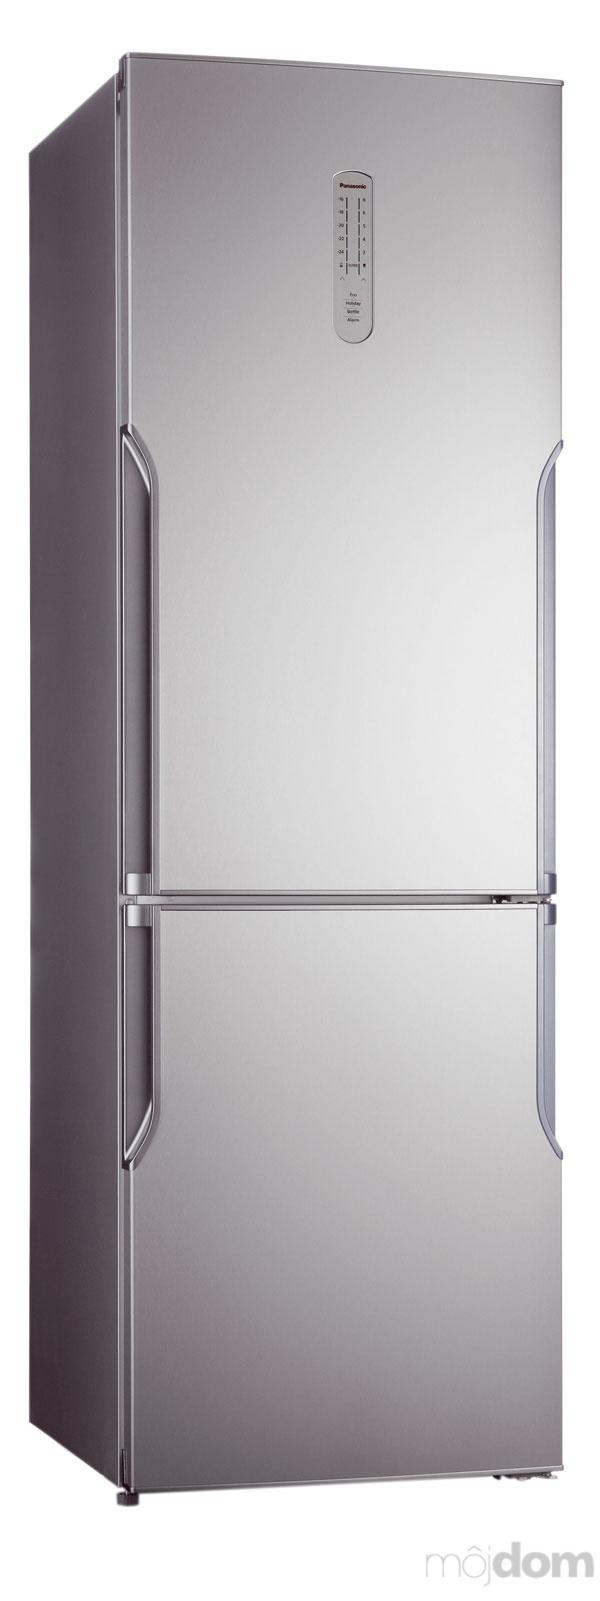 Kombinovaná chladnička Panasonic NR-B32SGI